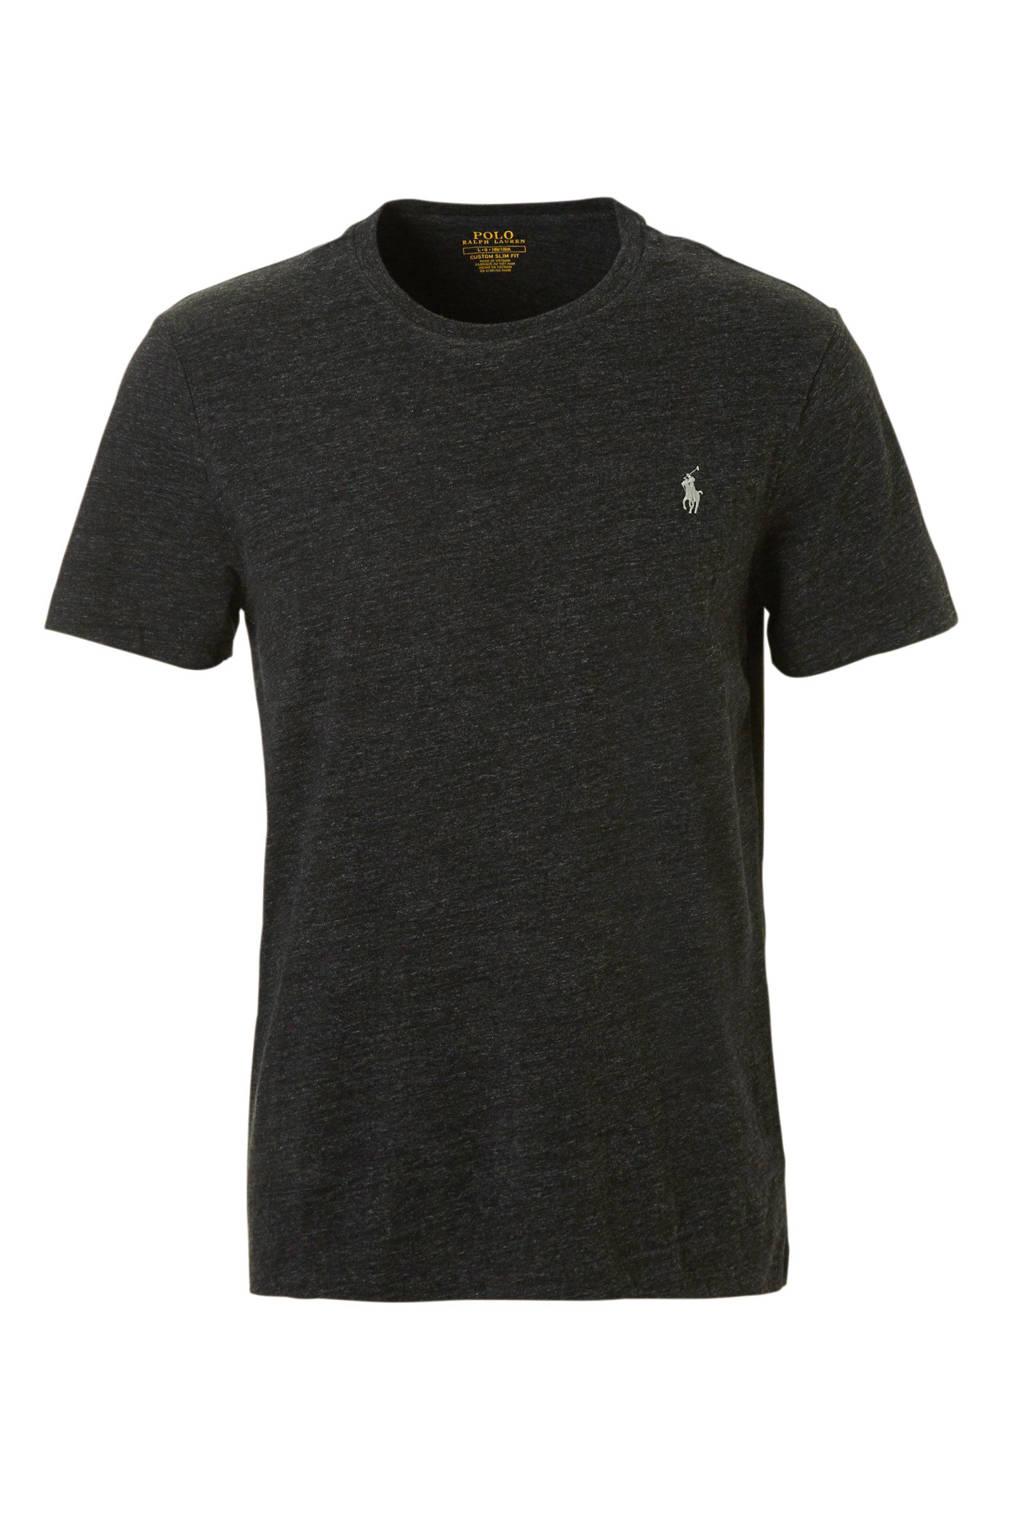 POLO Ralph Lauren slim fit T-shirt, Grijs